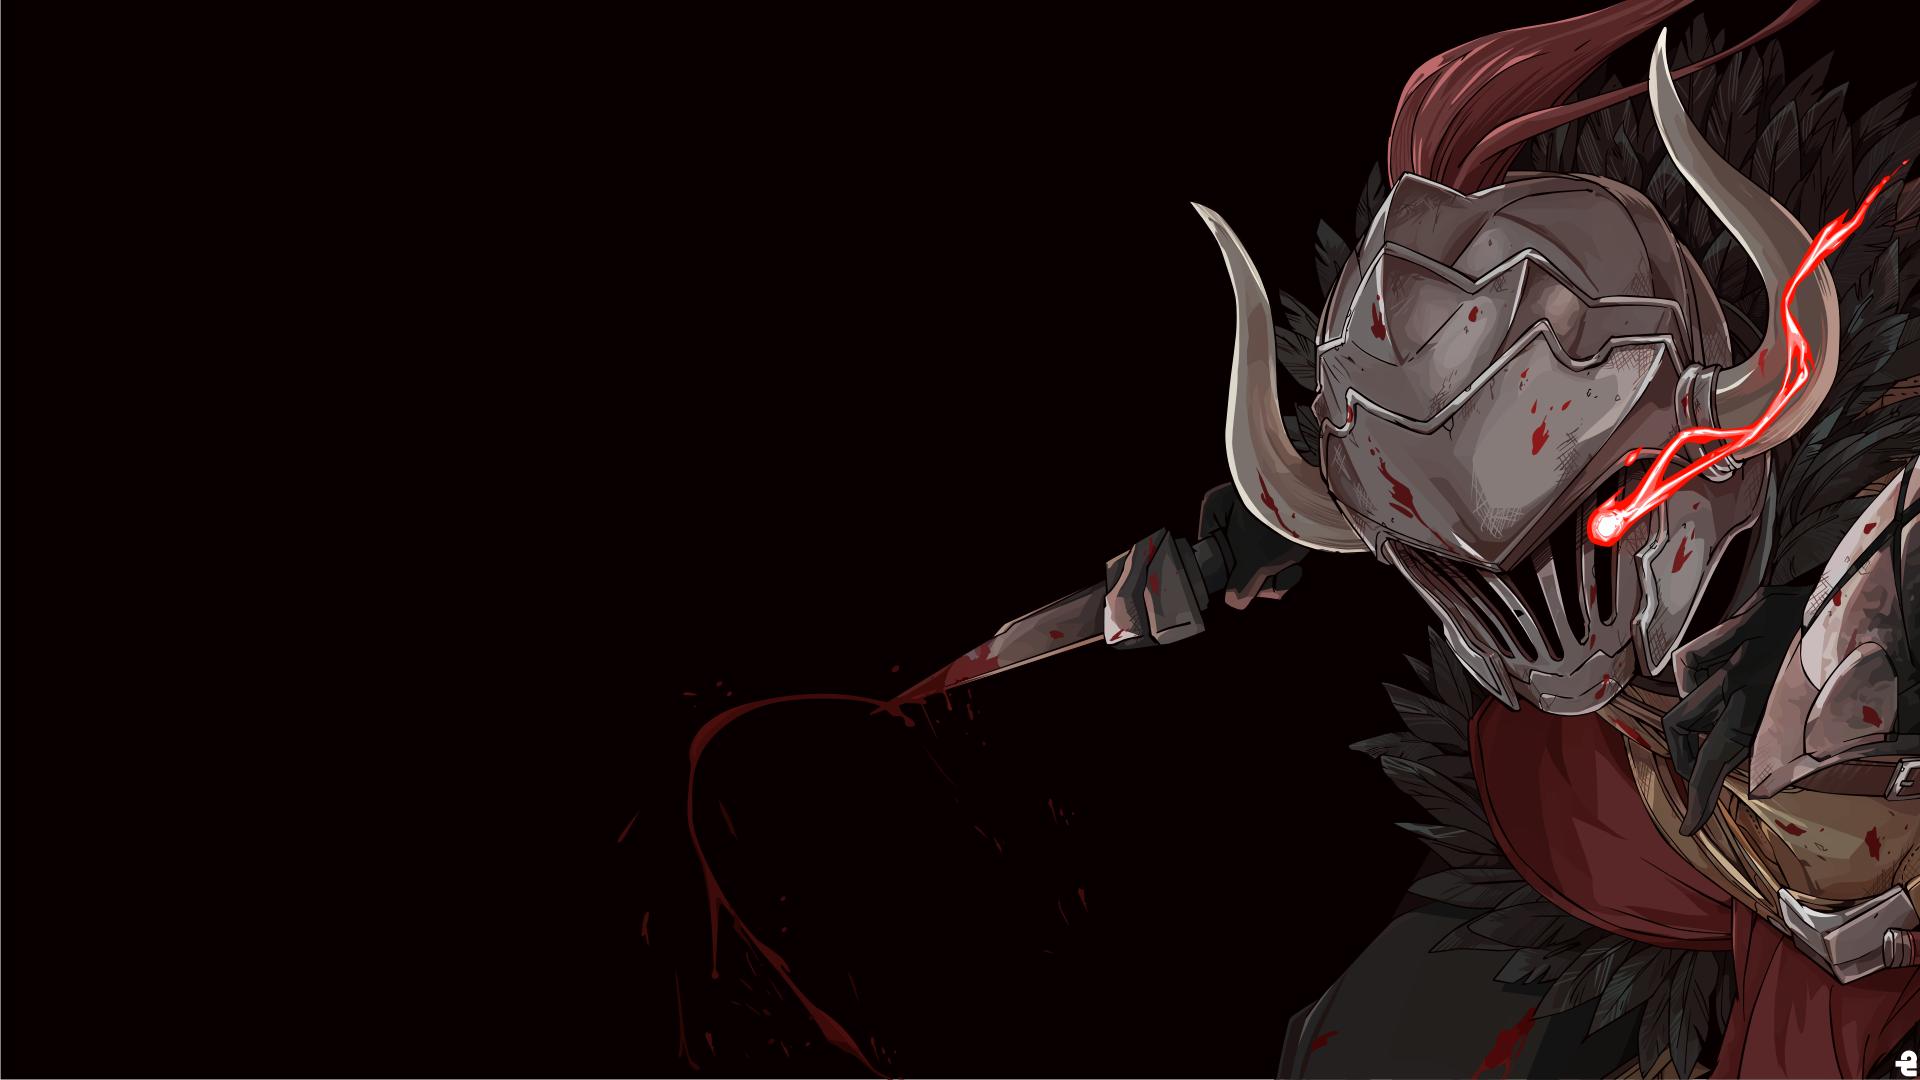 Goblin Slayer Hd Wallpaper Background Image 1920x1080